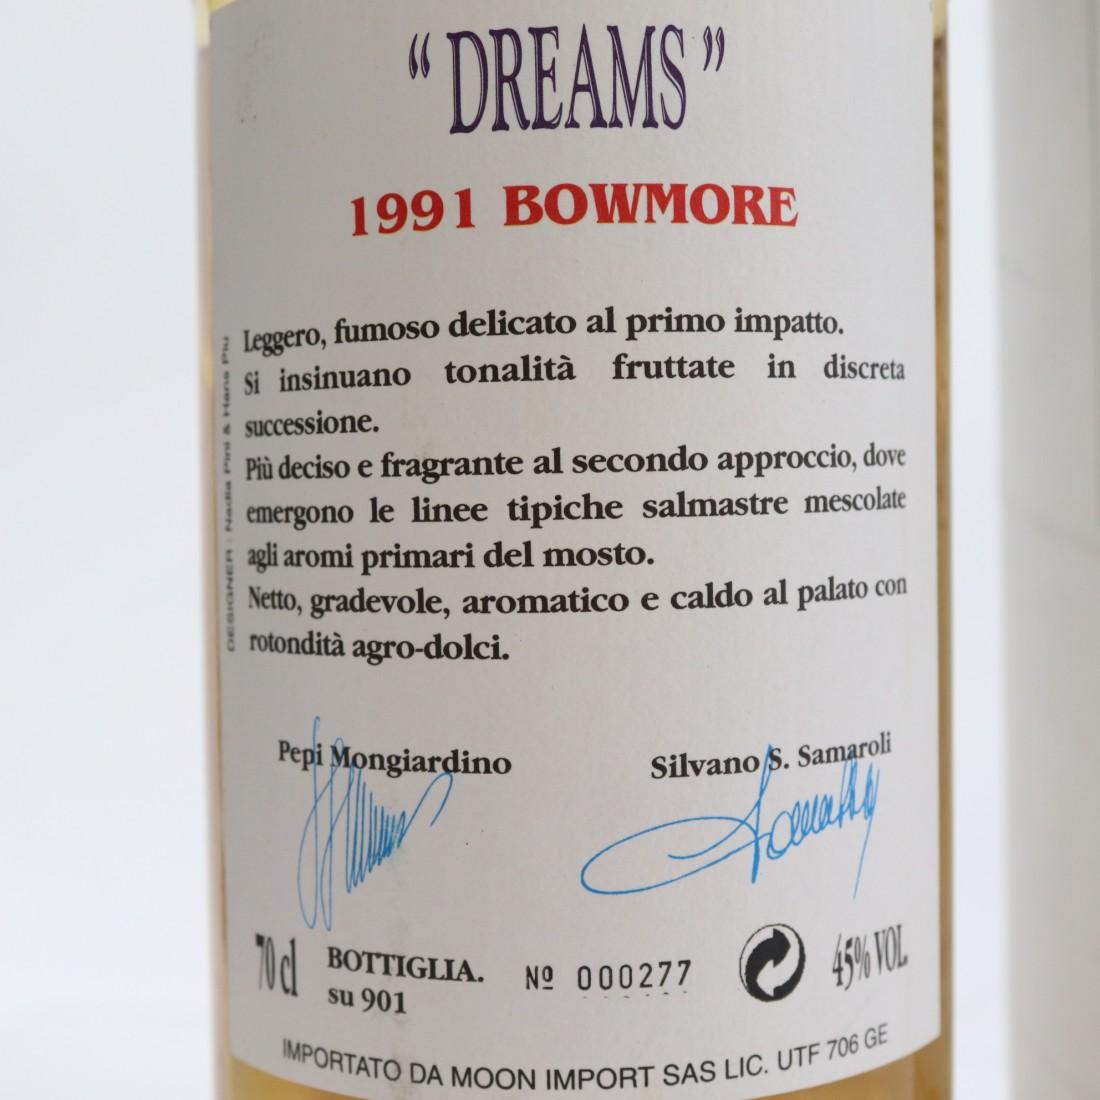 Bowmore 1991 Samaroli & Moon Import / Dreams